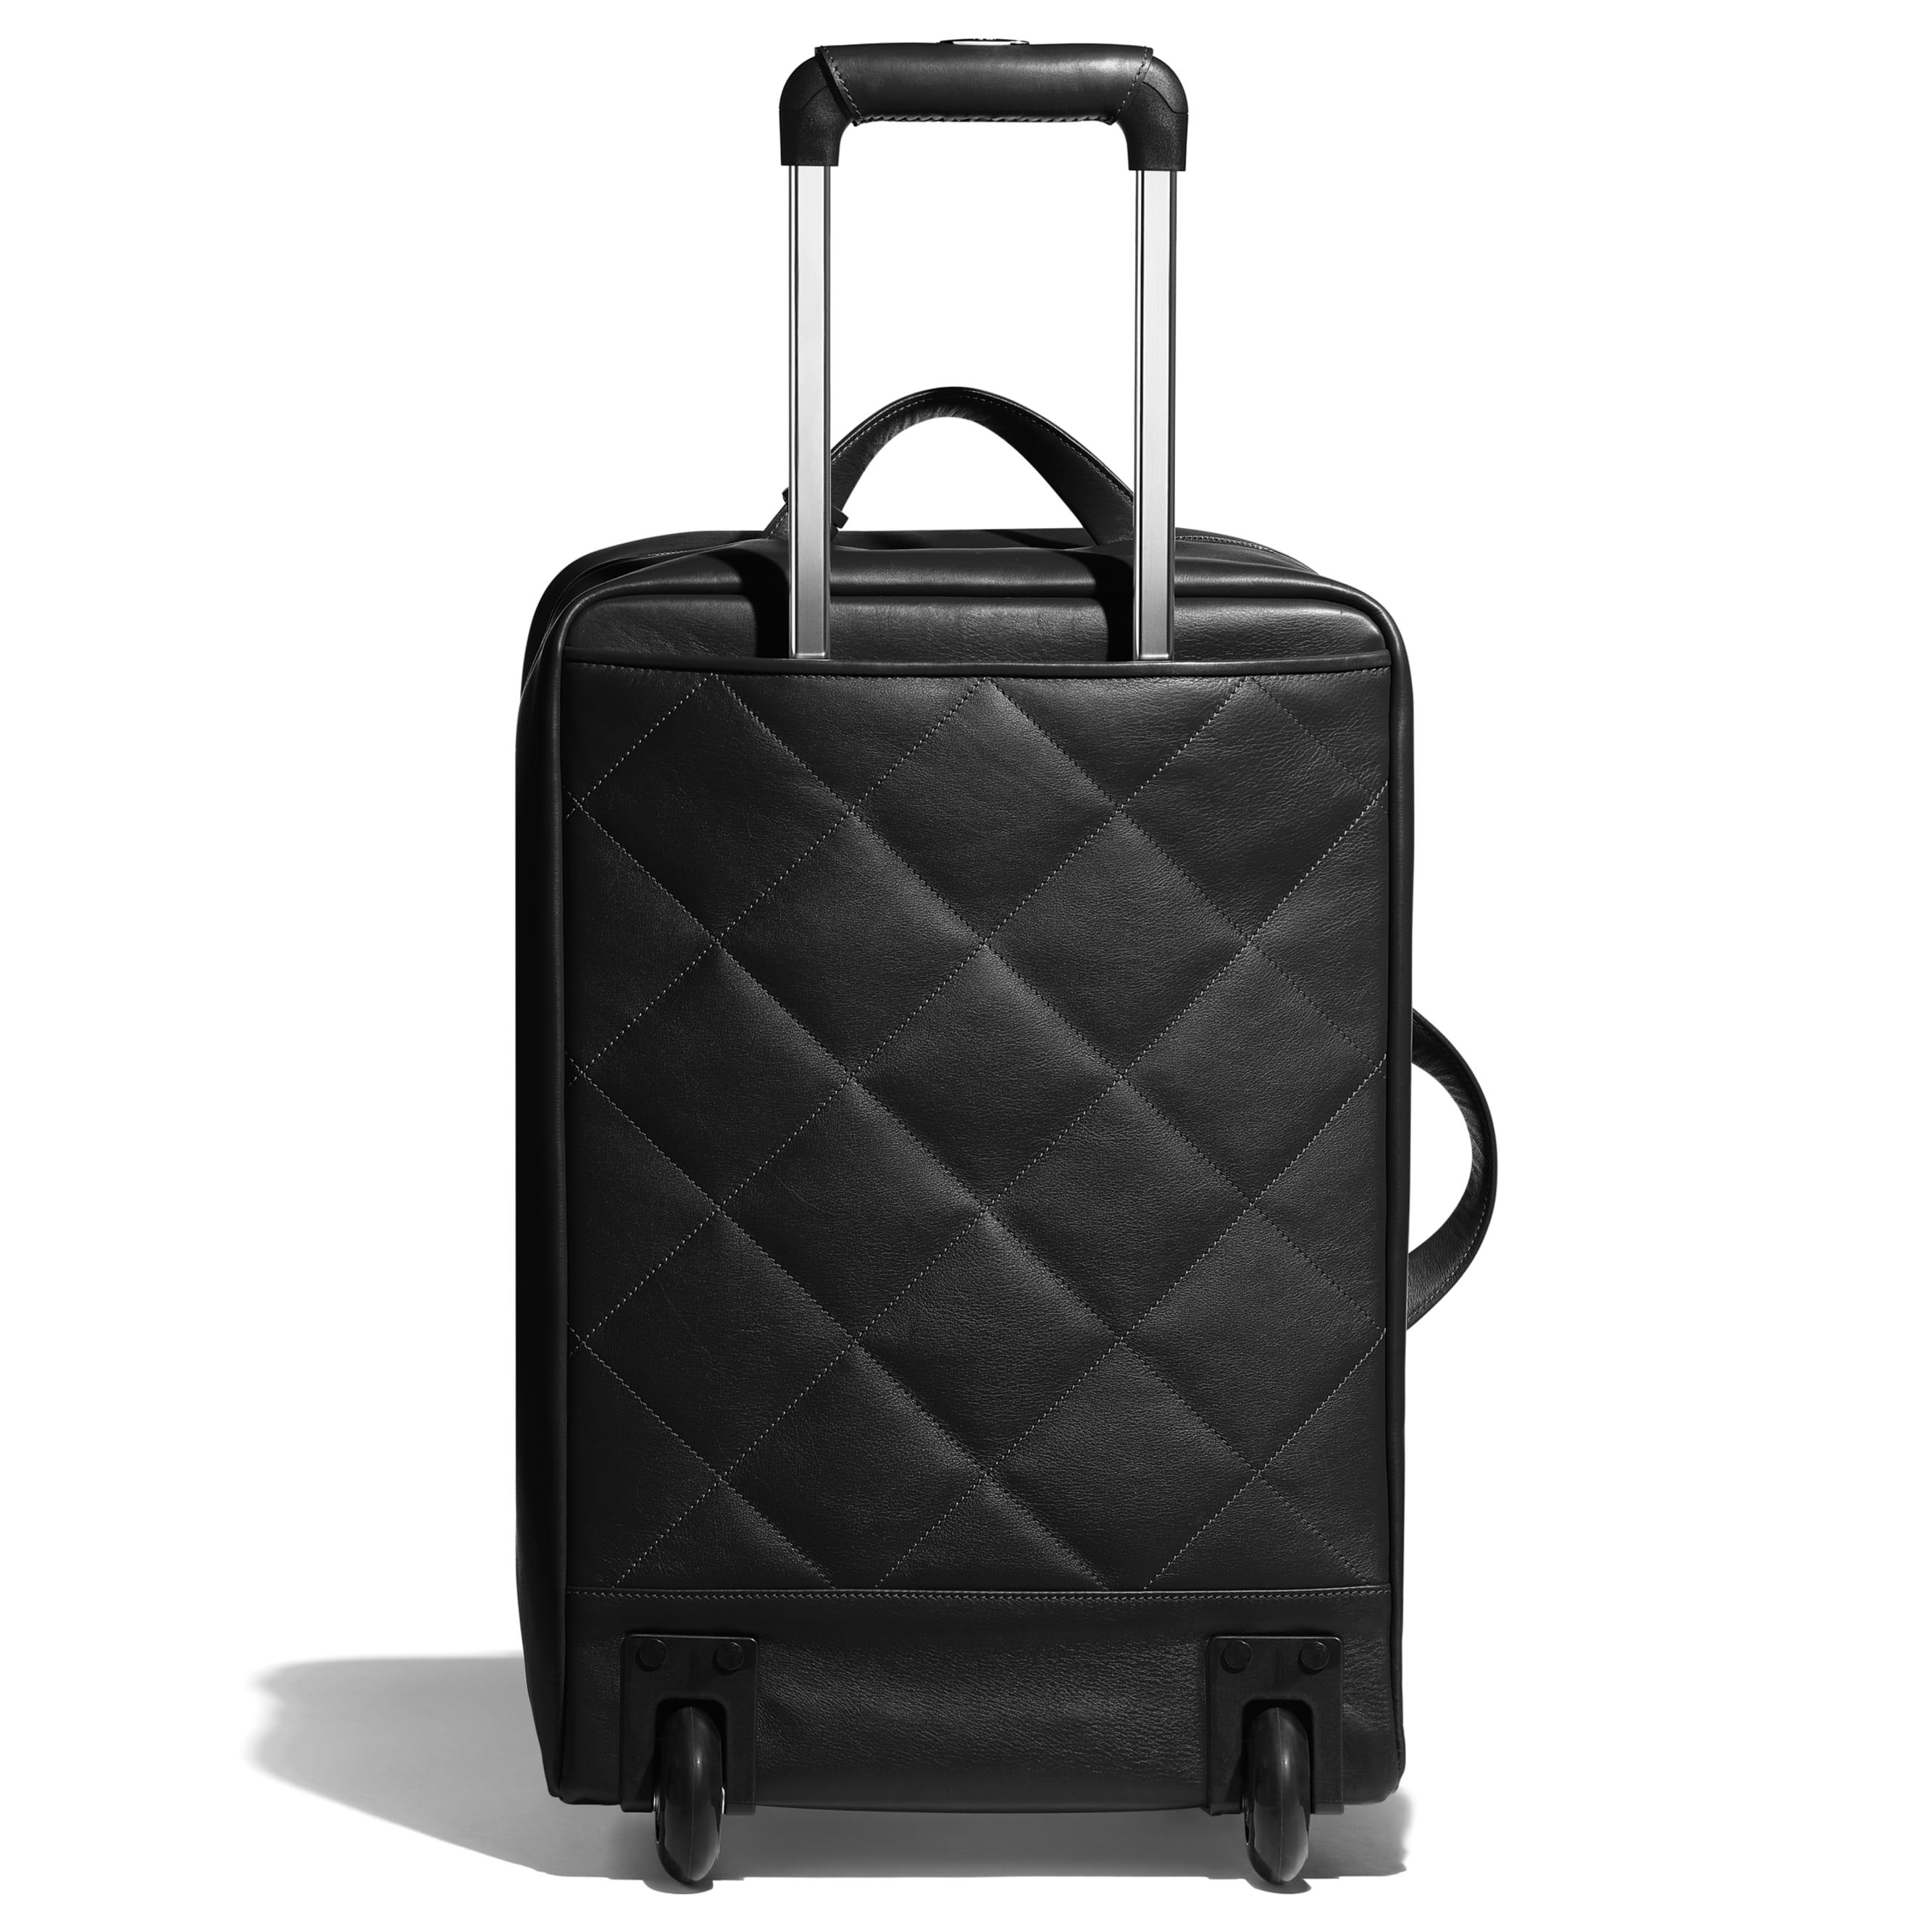 Trolley - Black - Calfskin & Silver-Tone Metal - CHANEL - Alternative view - see standard sized version